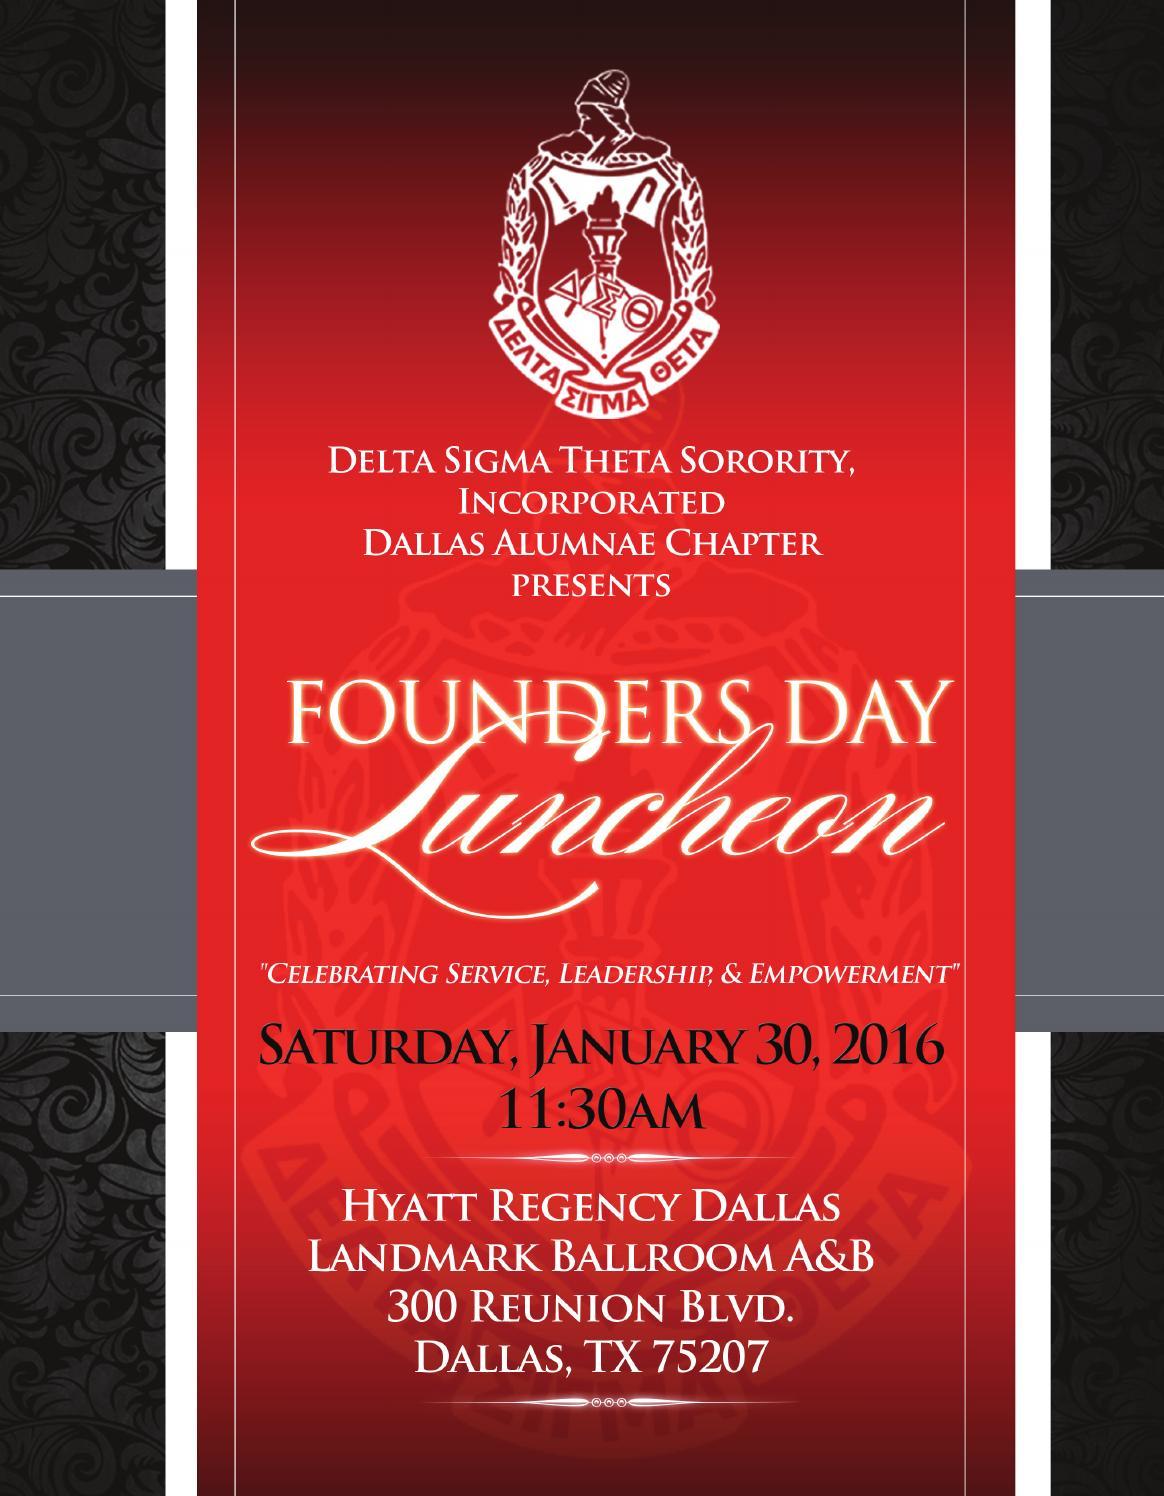 Delta Sigma Theta Sorority Inc Dallas Chapter By In House Media